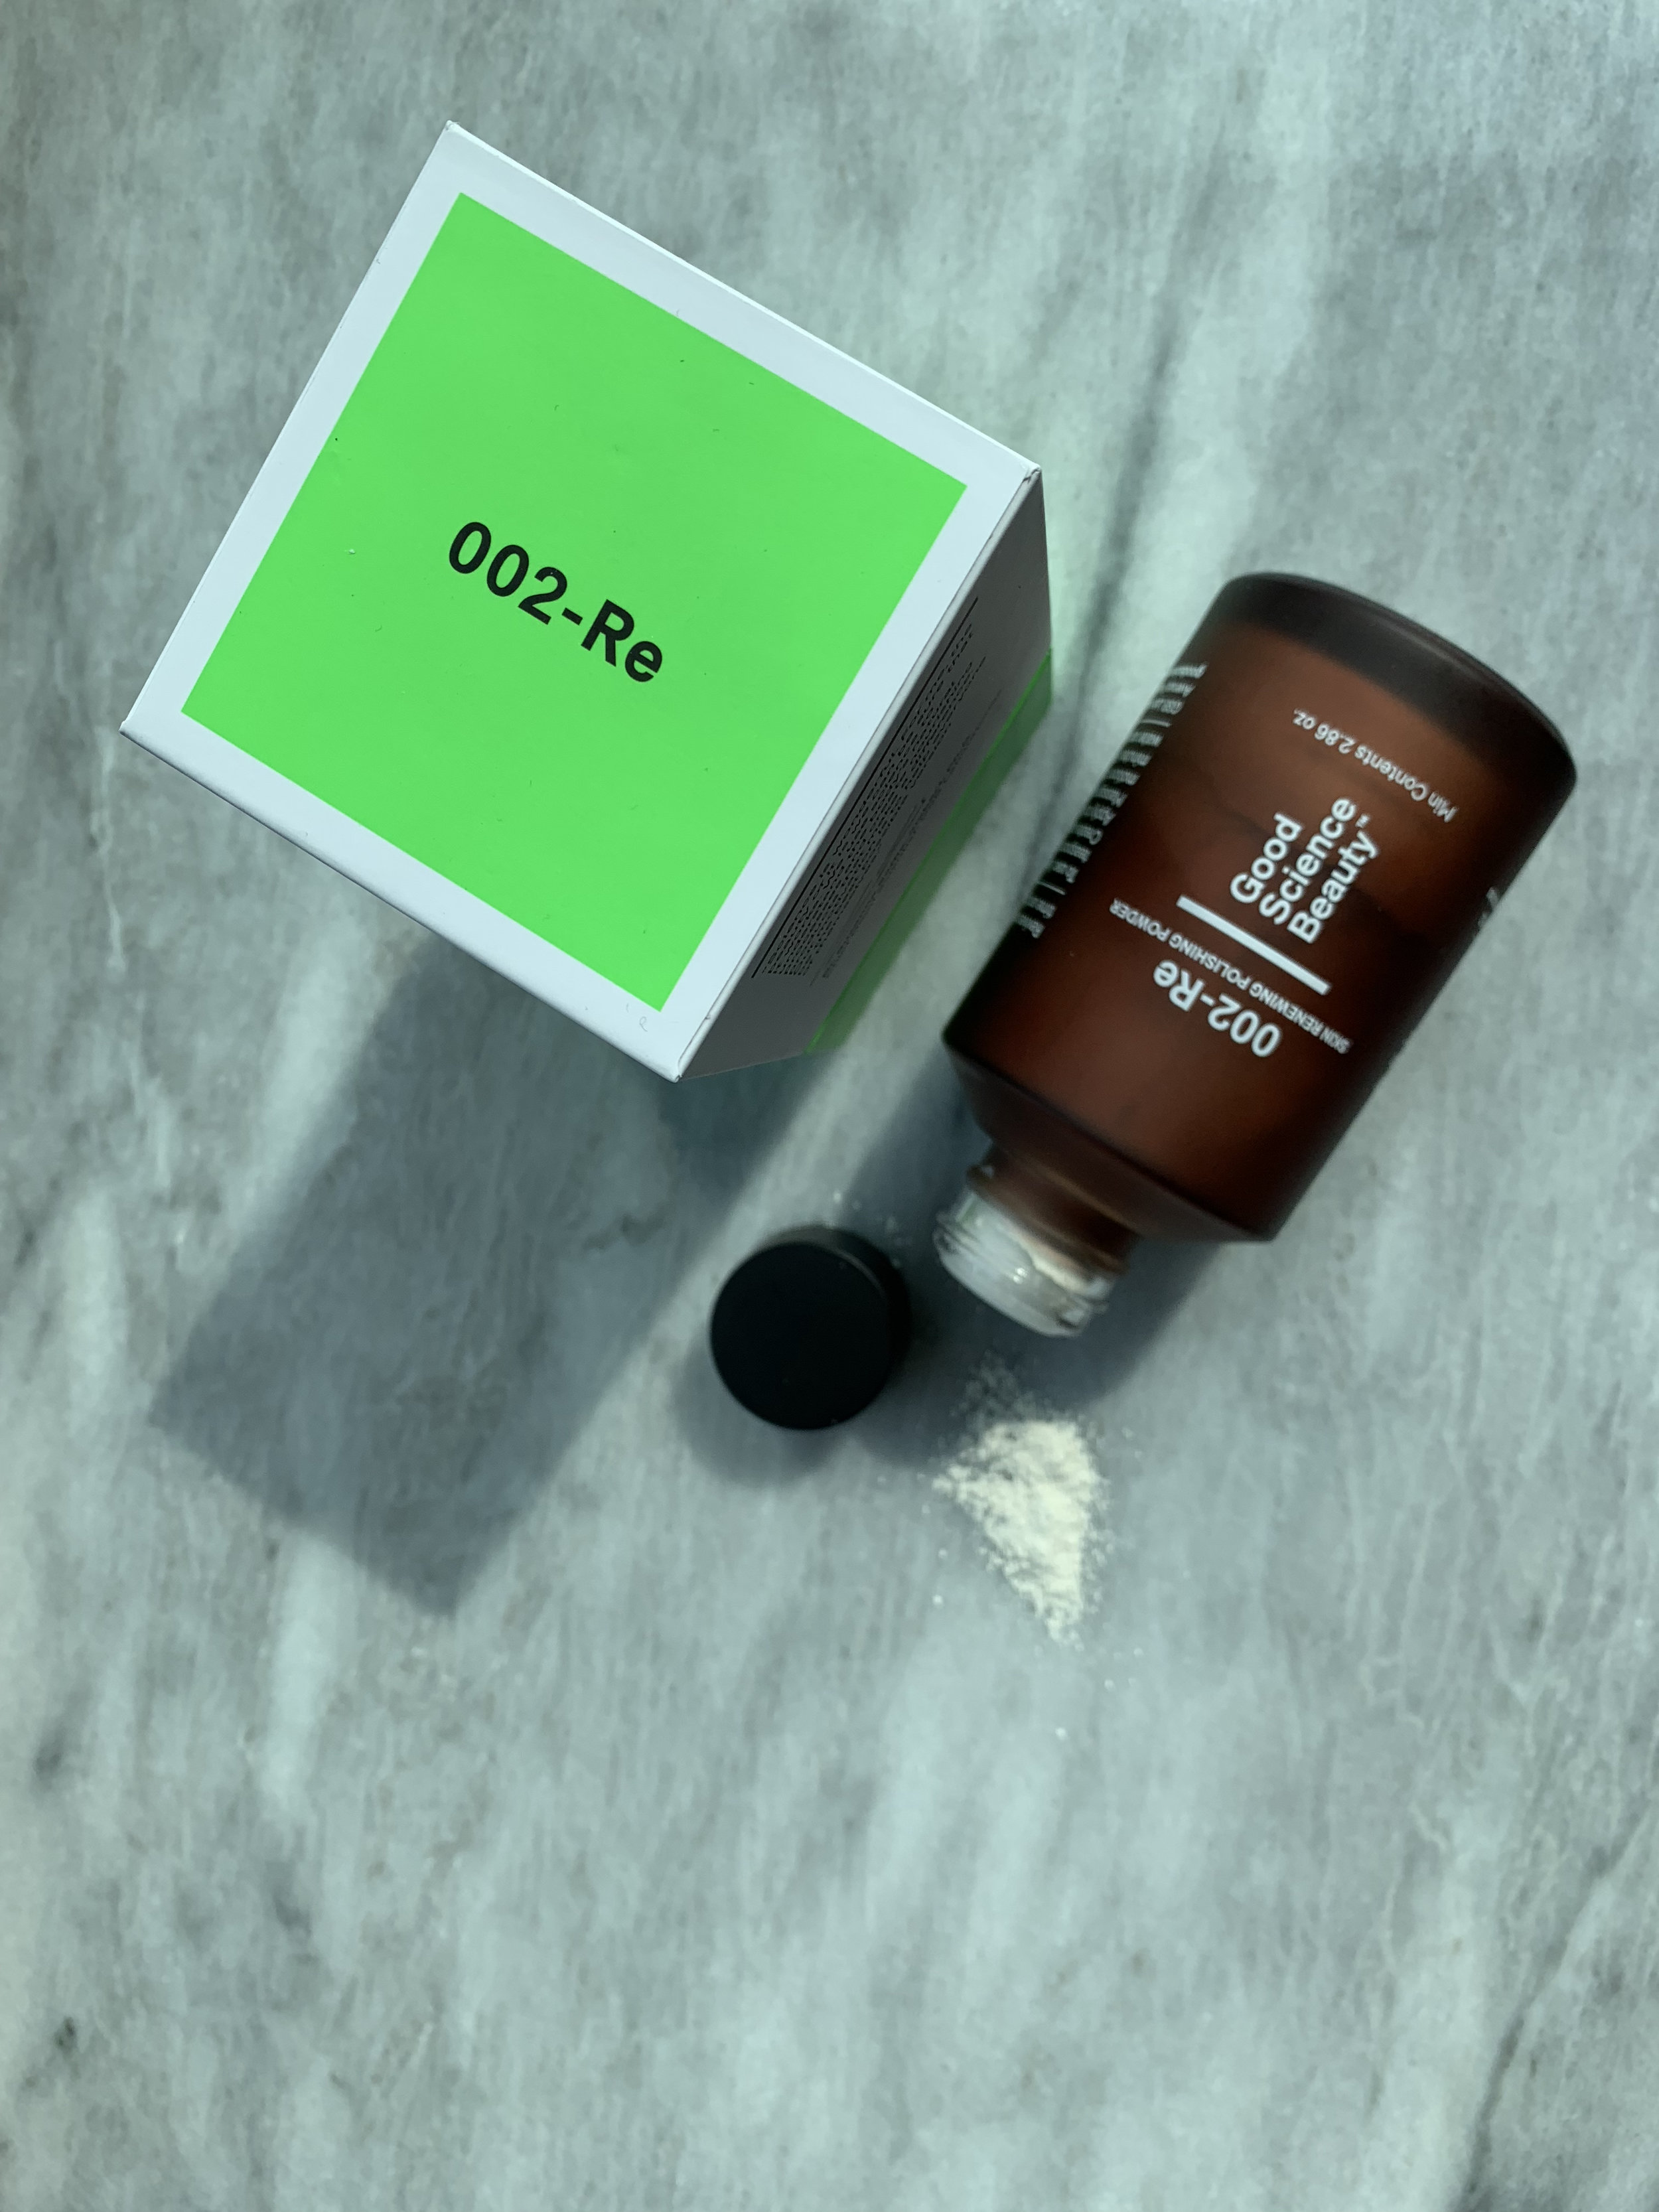 Good Science Beauty's Skin Renewing Polishing Powder.